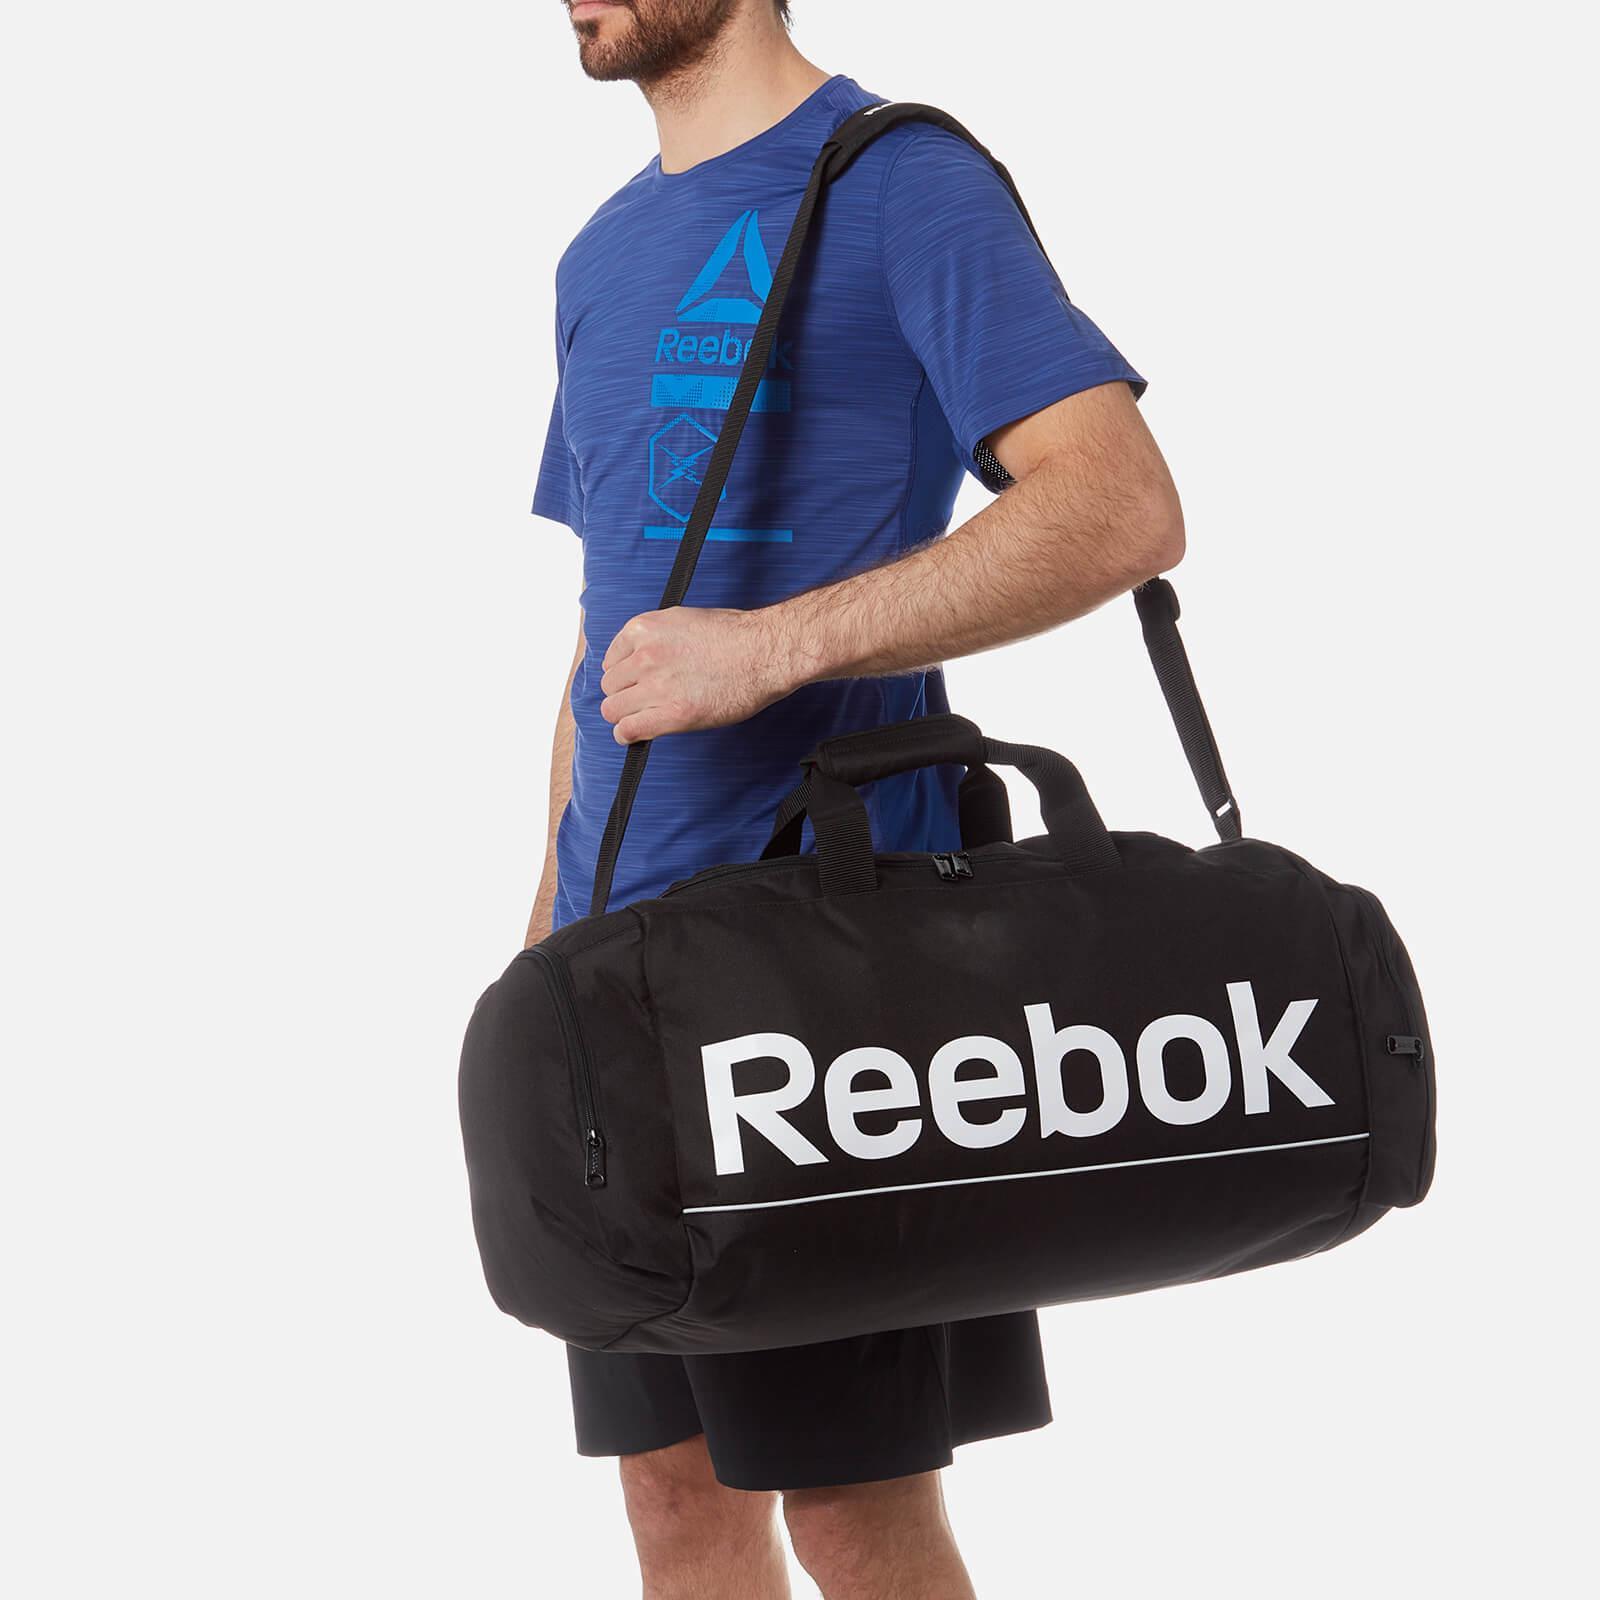 dd52622ed7f2a Reebok Synthetic Sport Roy Grip Bag in Black for Men - Lyst